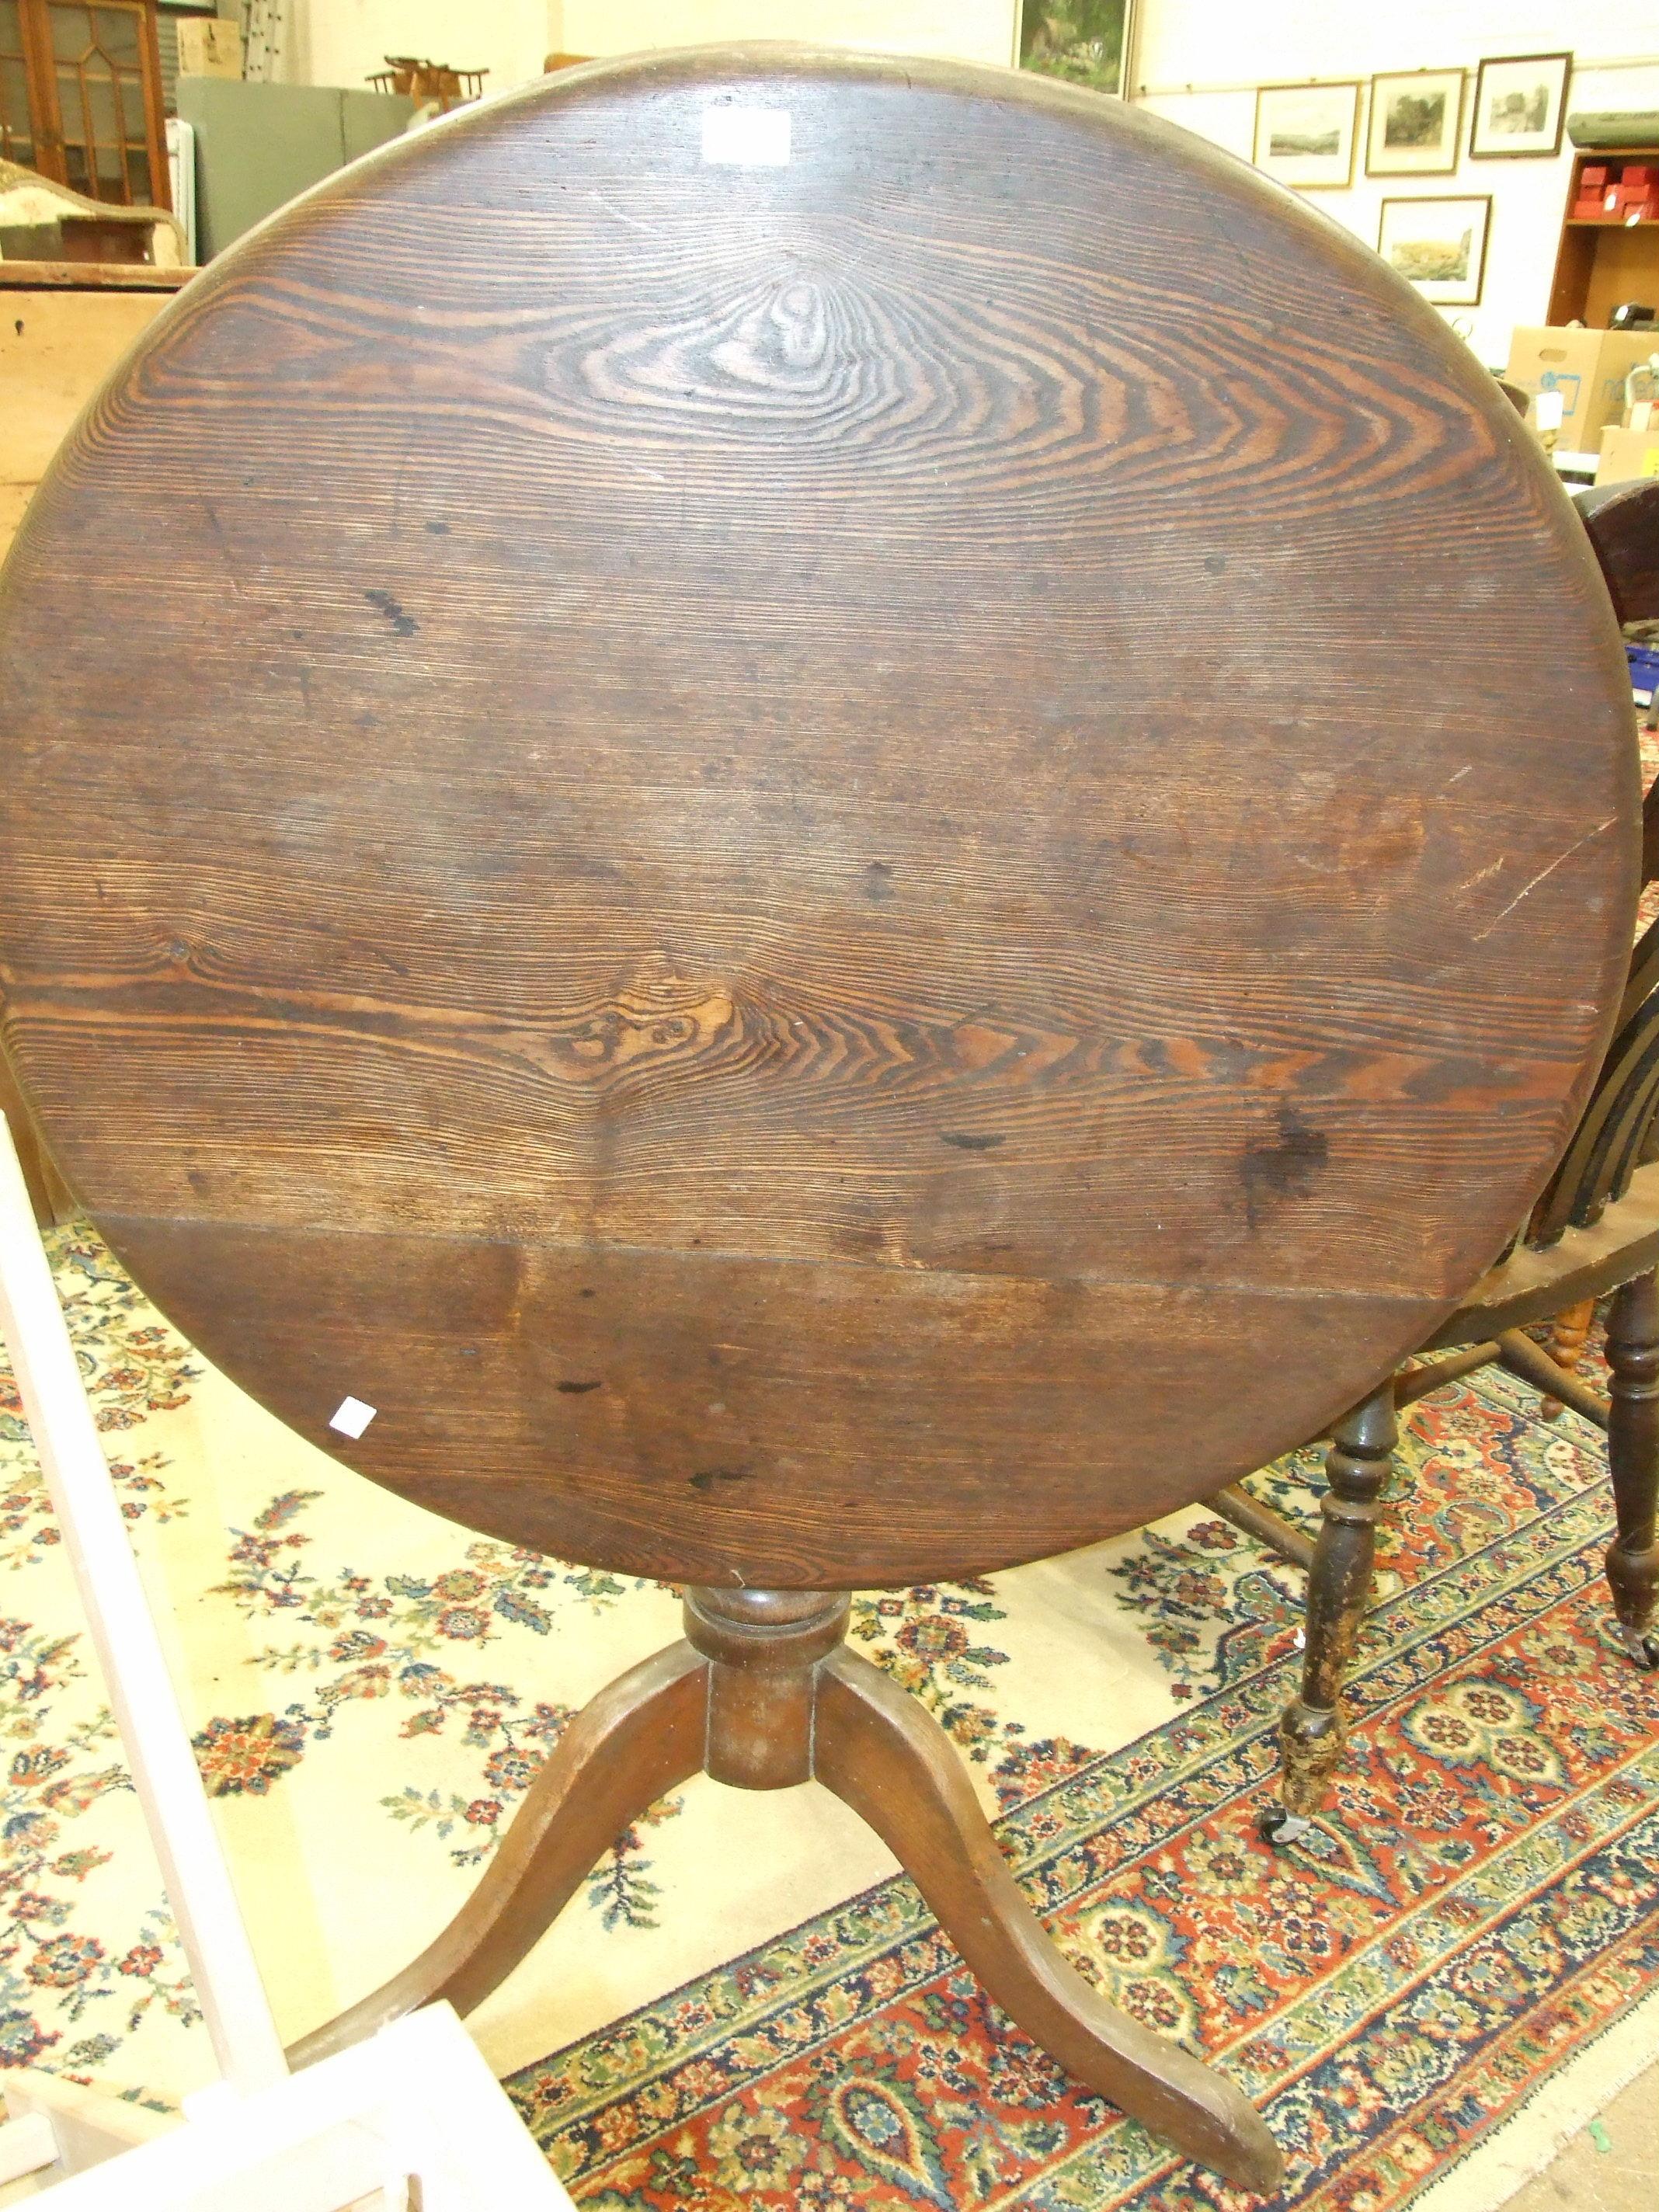 Lot 30 - A 20th century oak monk's bench, 106cm wide, an oak tilt-top circular table on triform support, 88cm